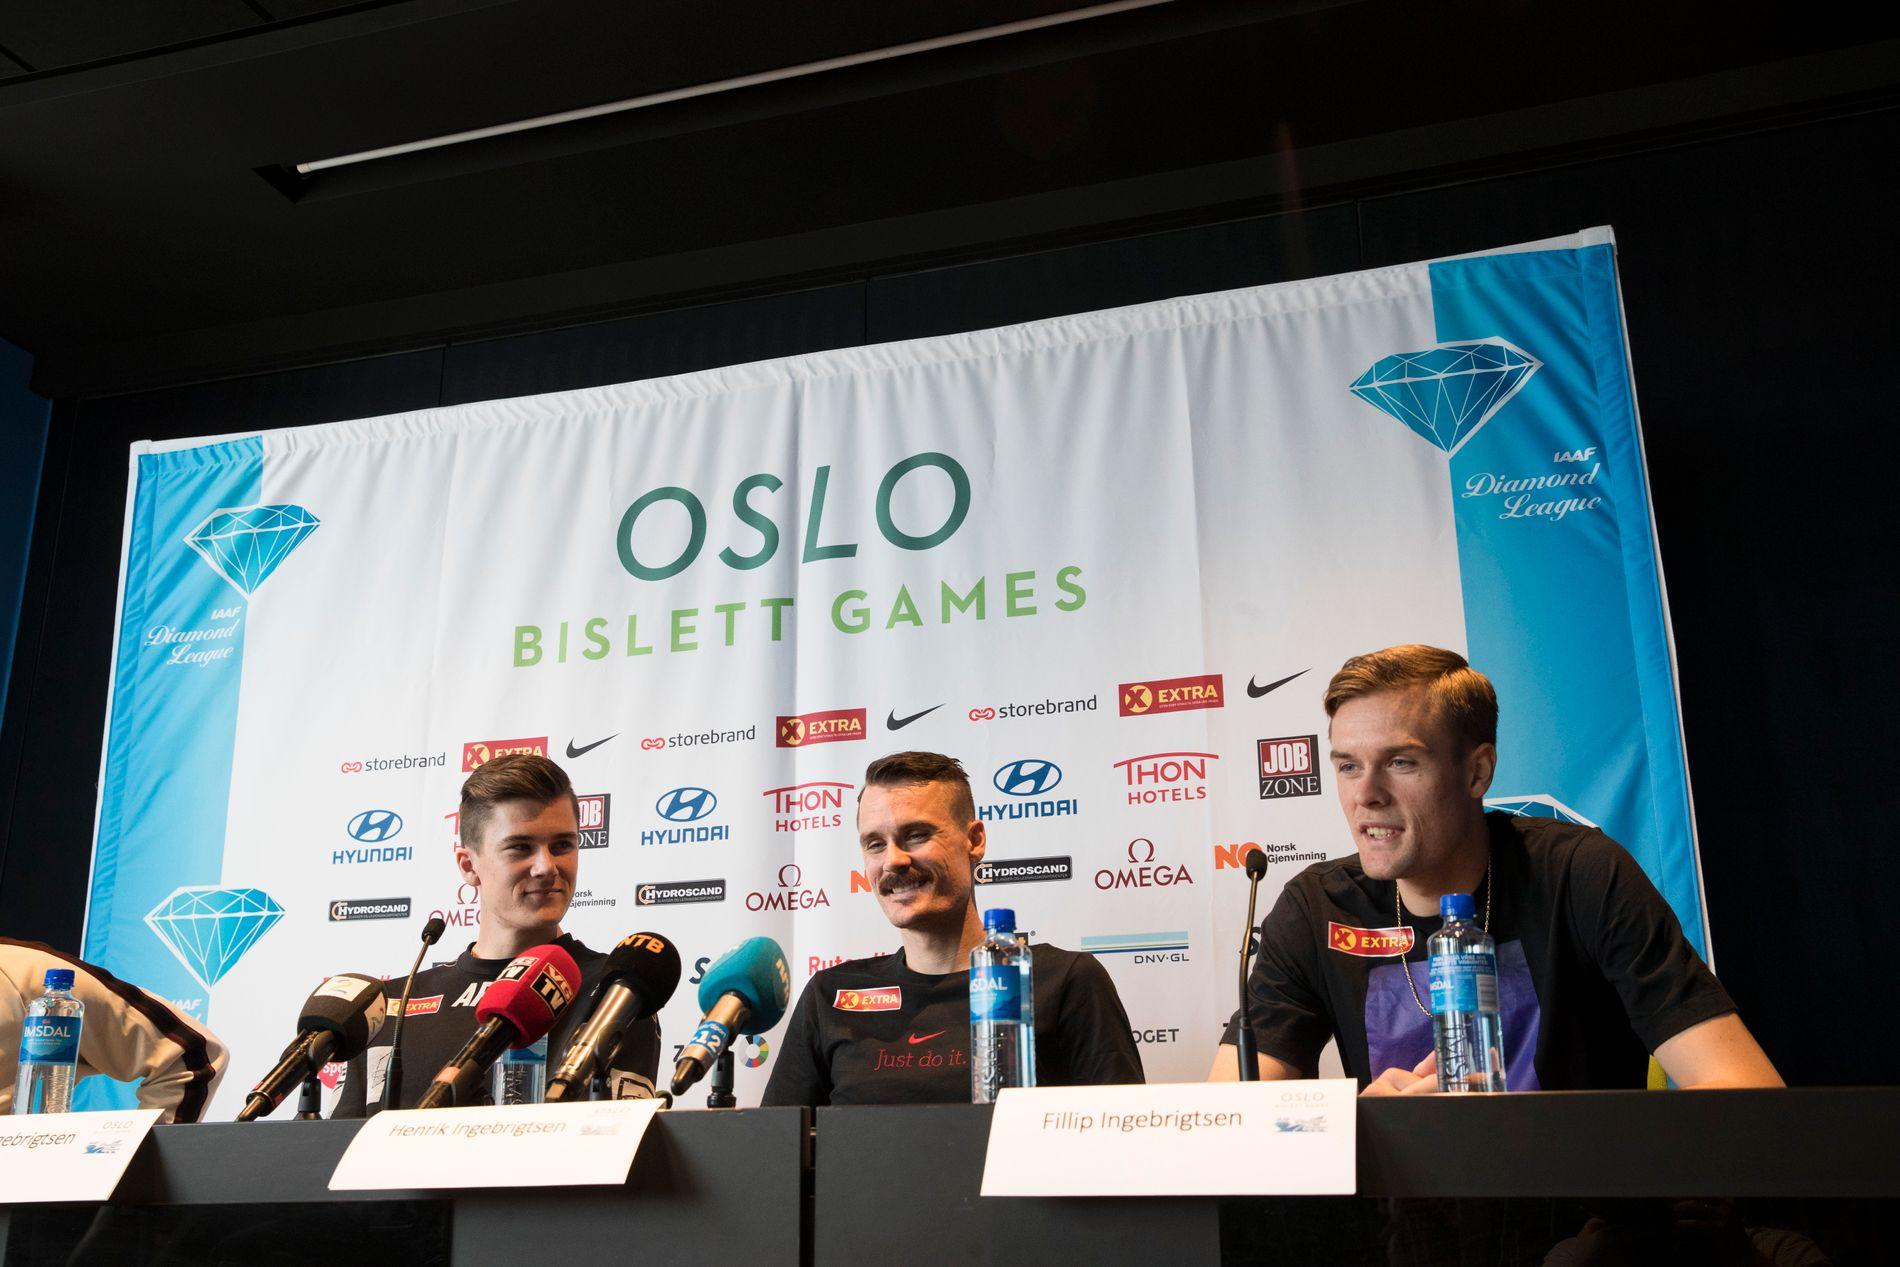 Team Ingebrigtsen med Jakob Ingebrigtsen, Henrik Ingebrigtsen og Filip Ingebrigtsen på tirsdagens pressekonferanse før Bislett Games.